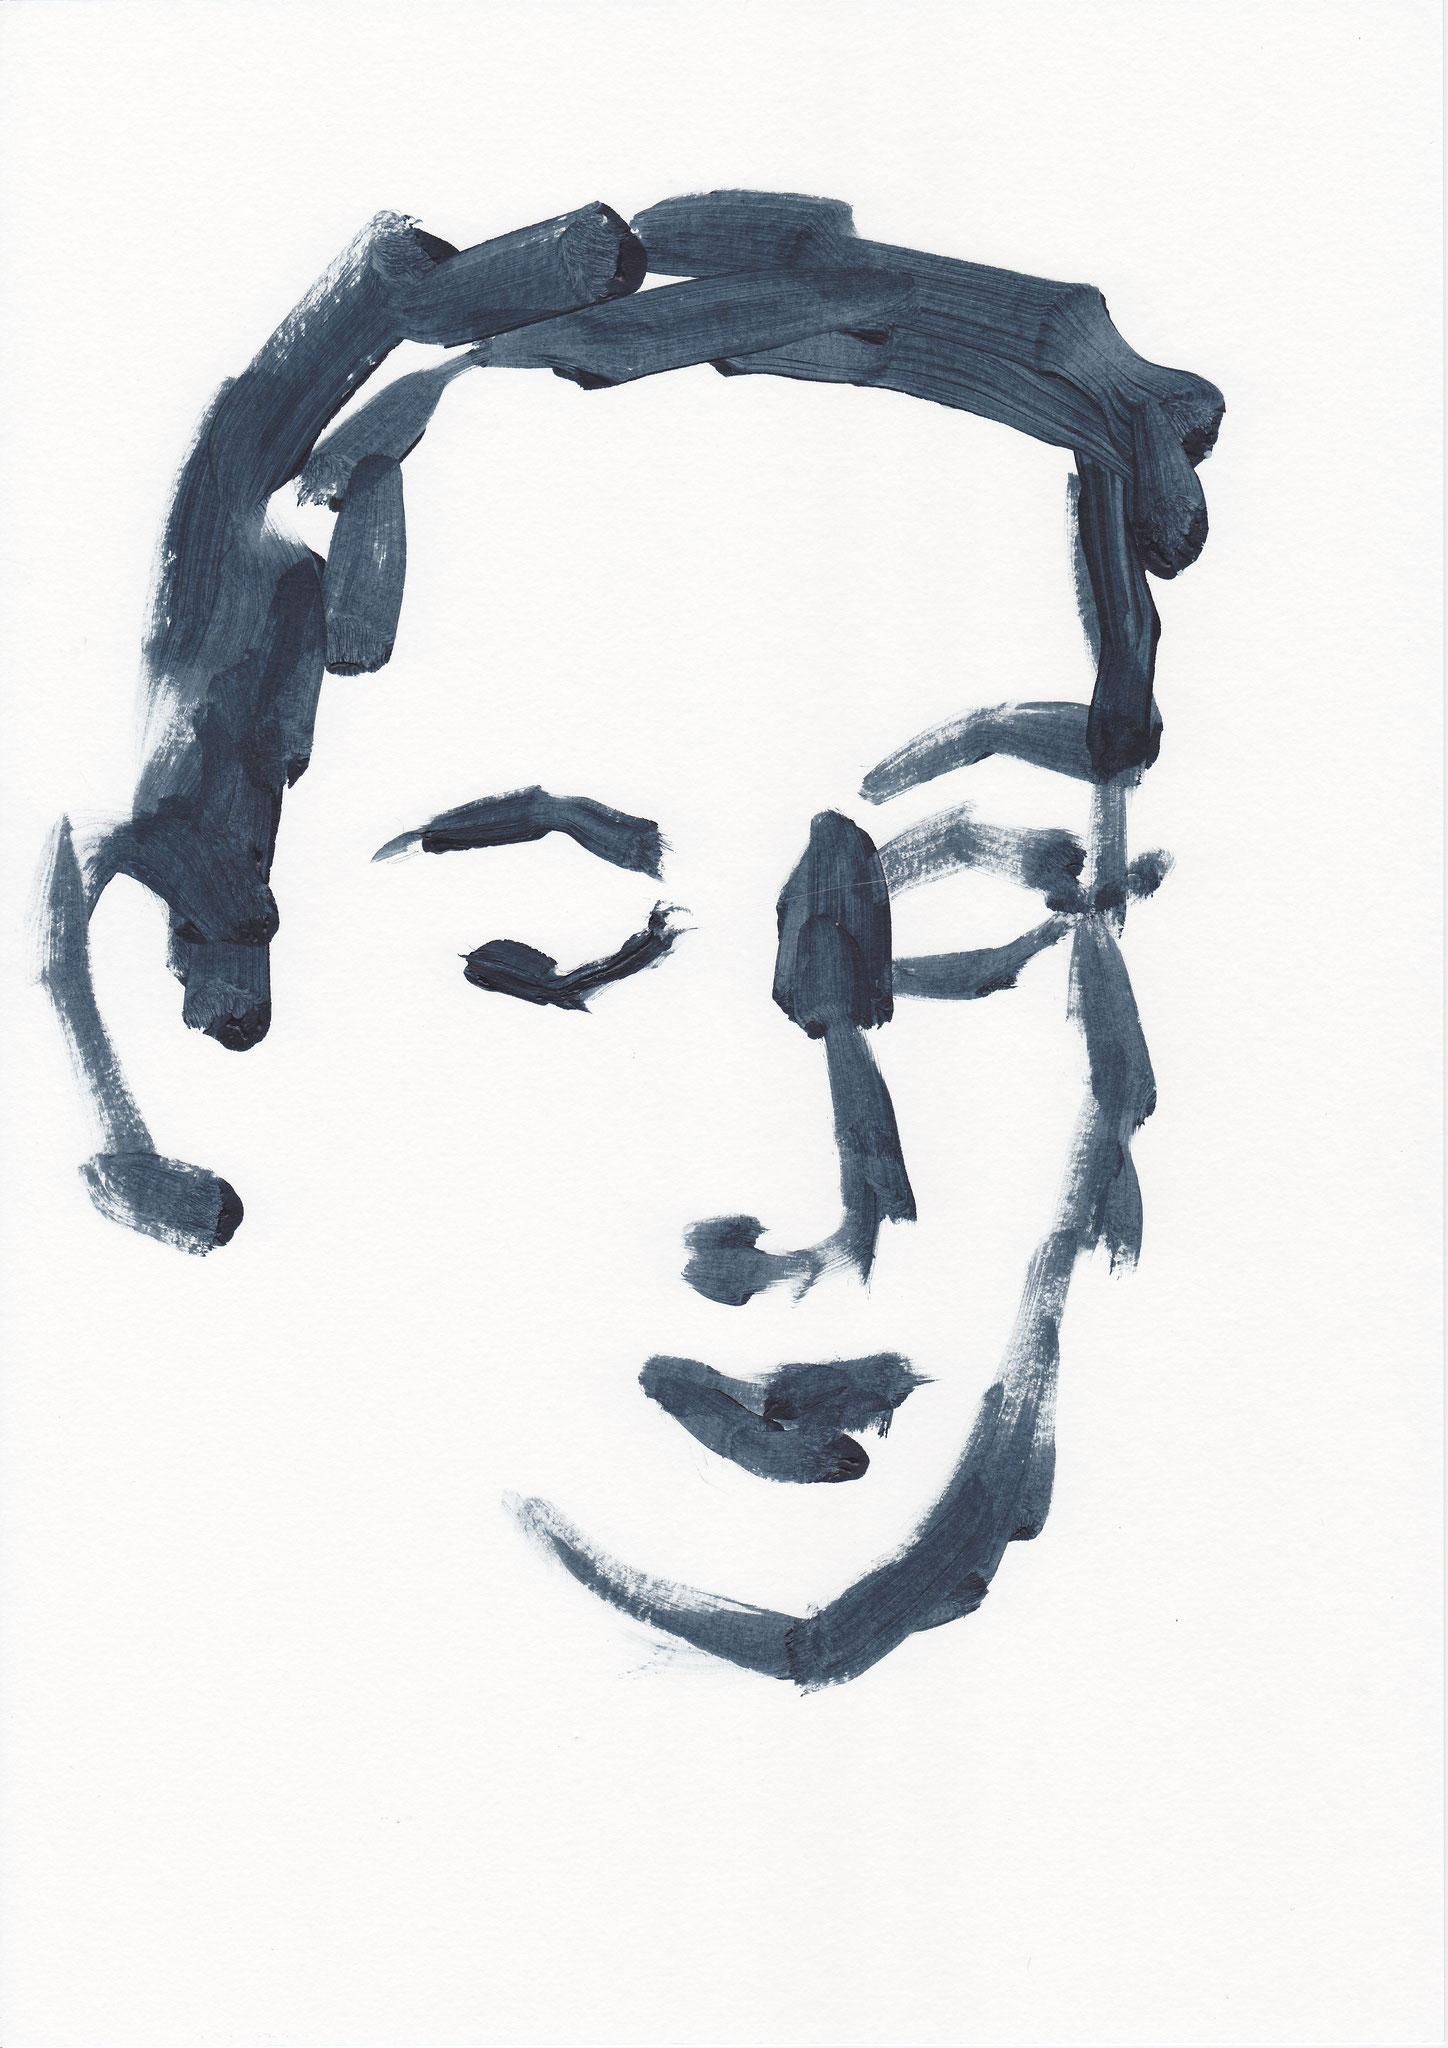 005 , acrylic on paper , 29.7 x 21cm , Selina Saranova